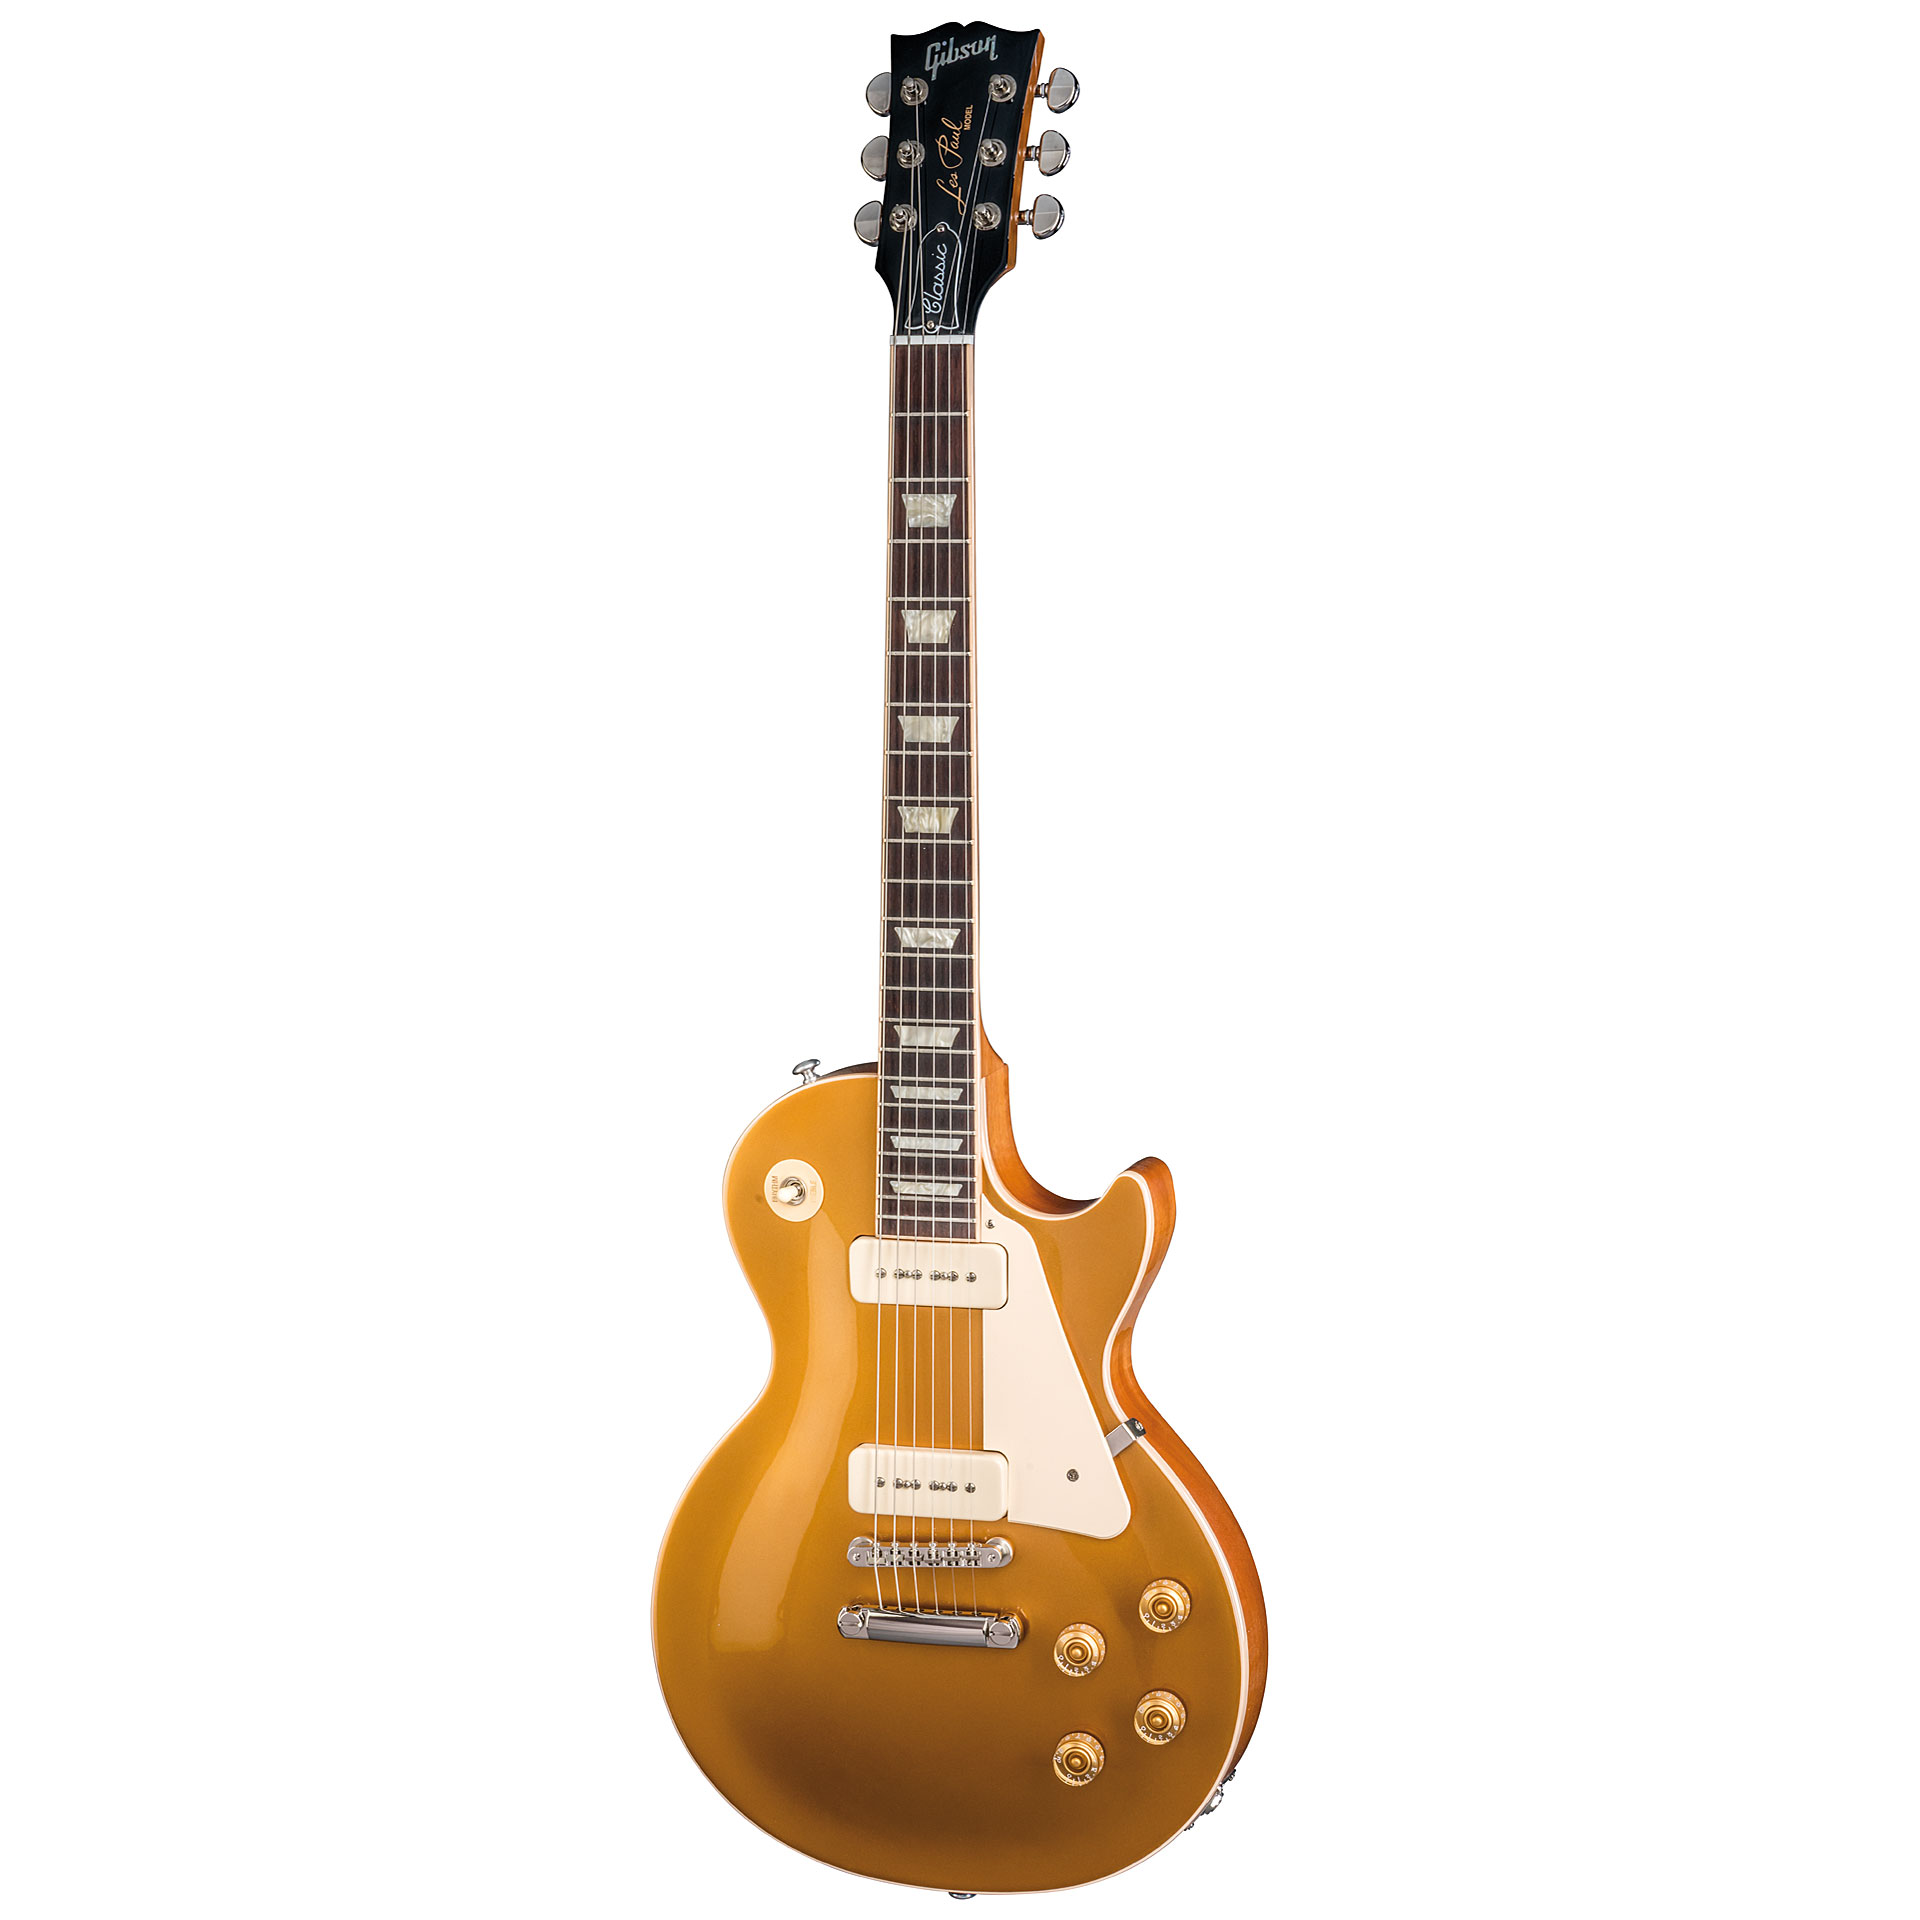 gibson les paul classic 2018 goldtop guitare lectrique. Black Bedroom Furniture Sets. Home Design Ideas